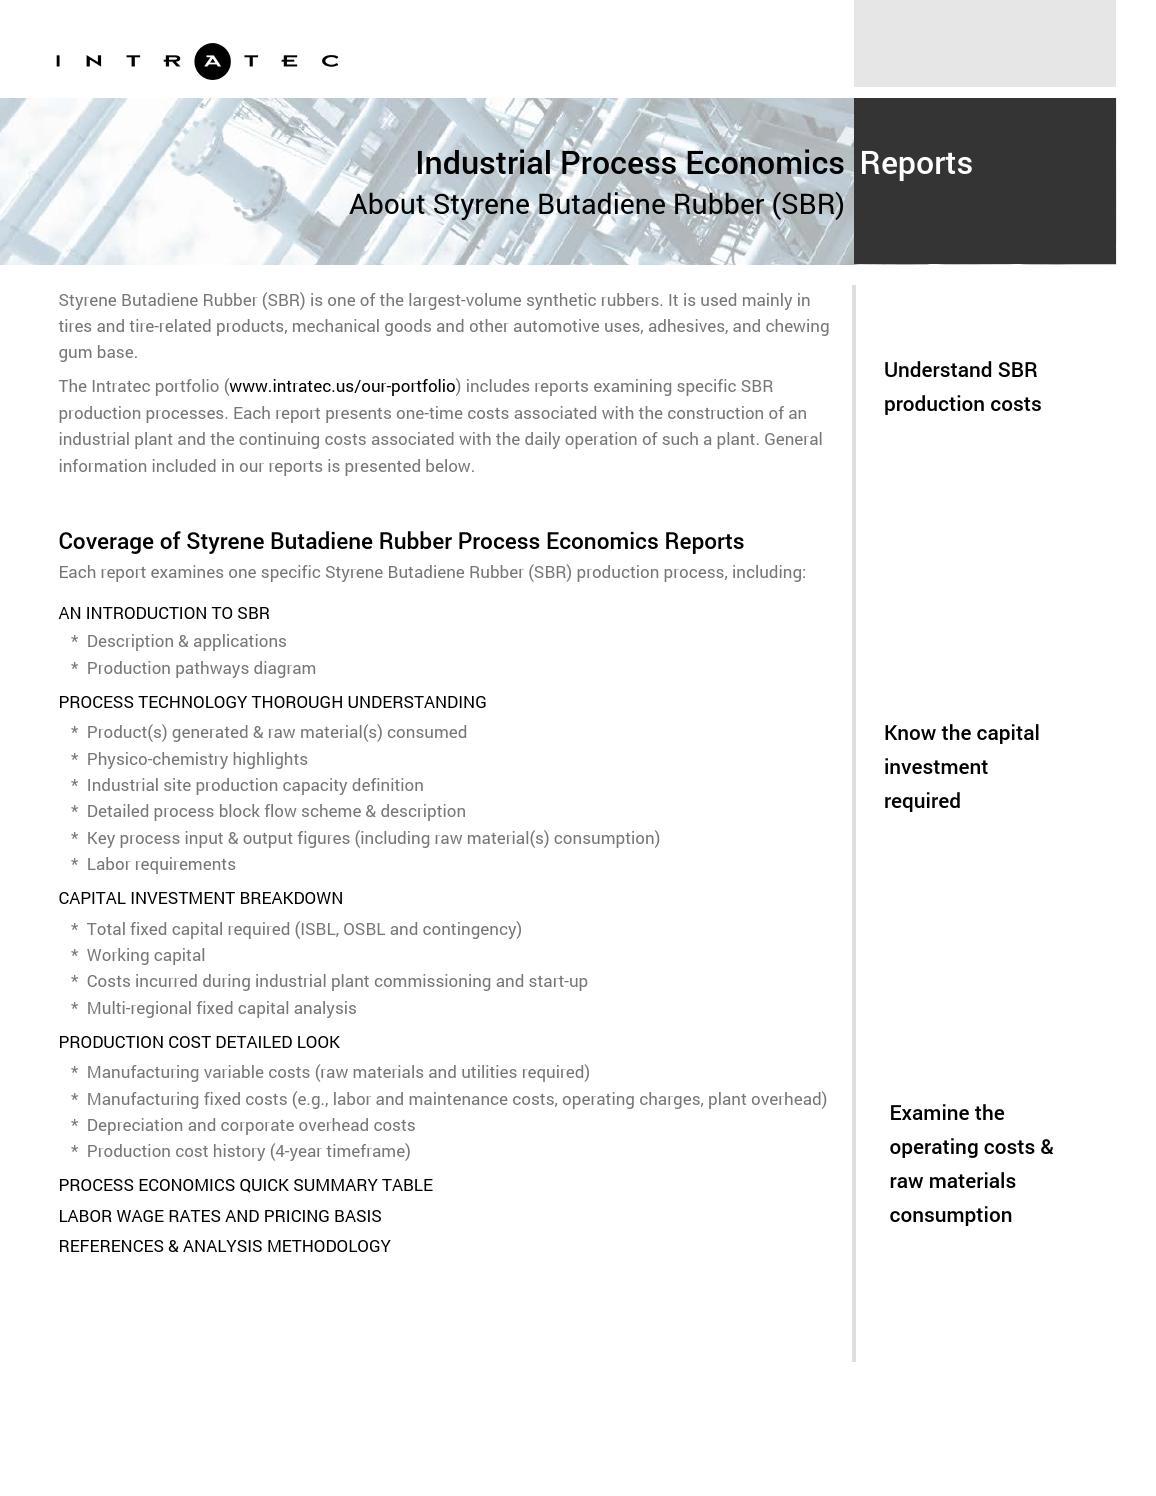 styrene production process flow diagram 2006 subaru impreza headlight wiring feasibility studies sbr manufacturing by intratec